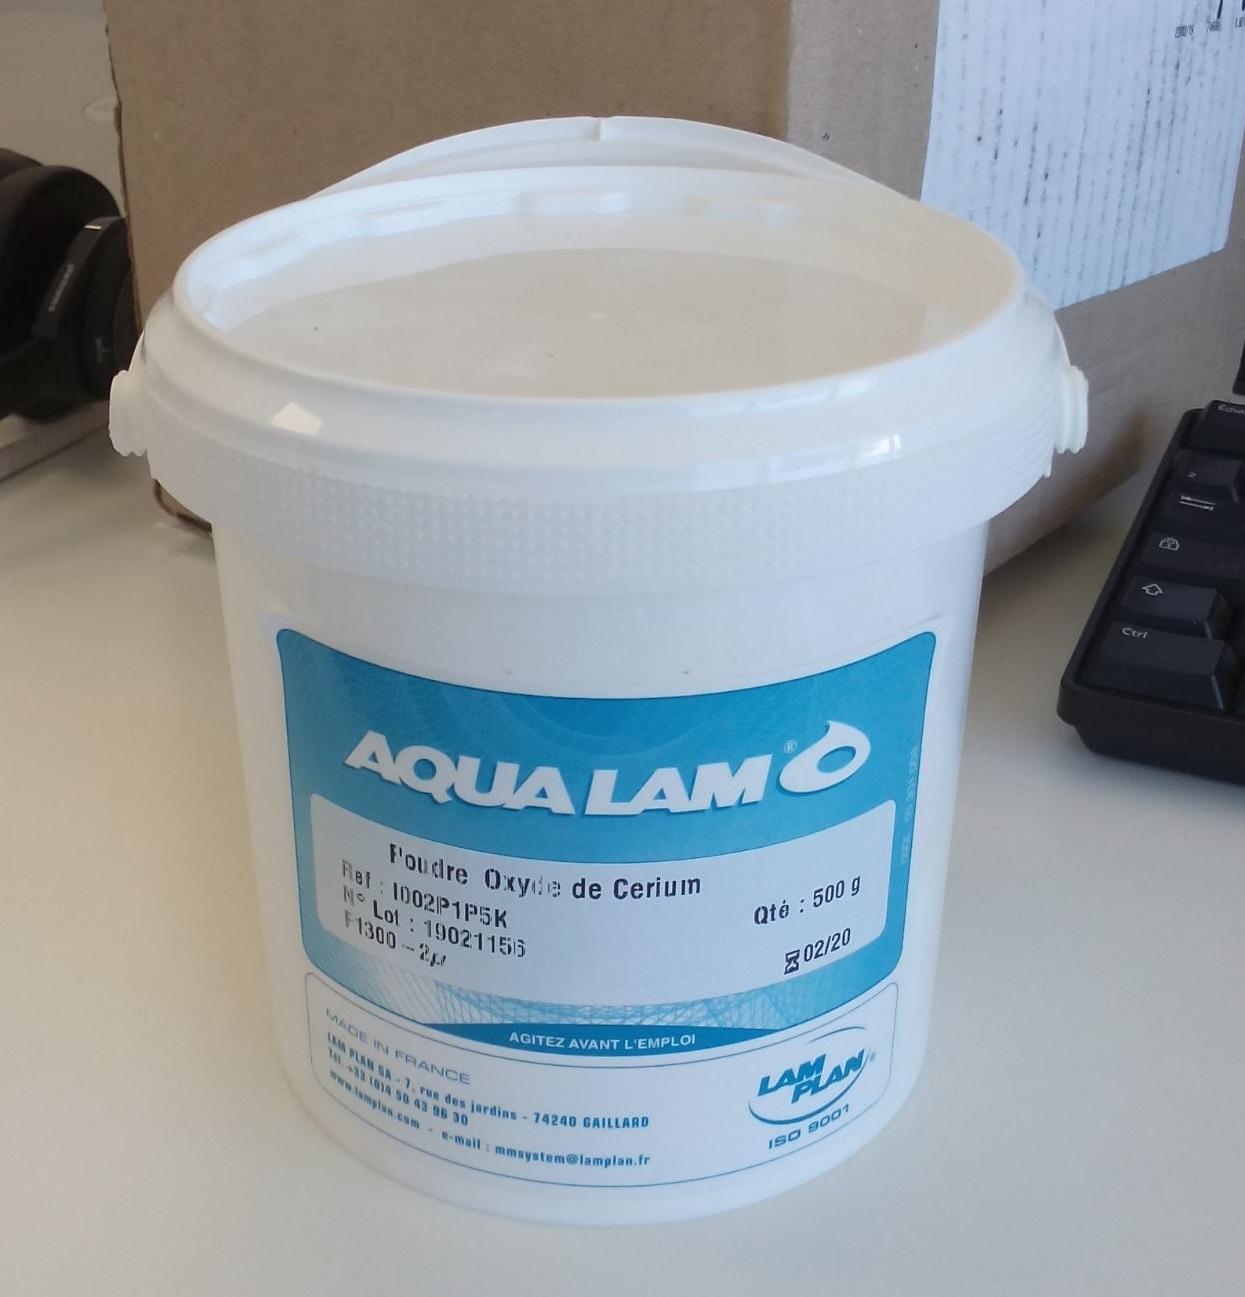 aqualam-ceo2-2um-500g.jpg.4afe05ecf5643c9de030d55596d009fd.jpg